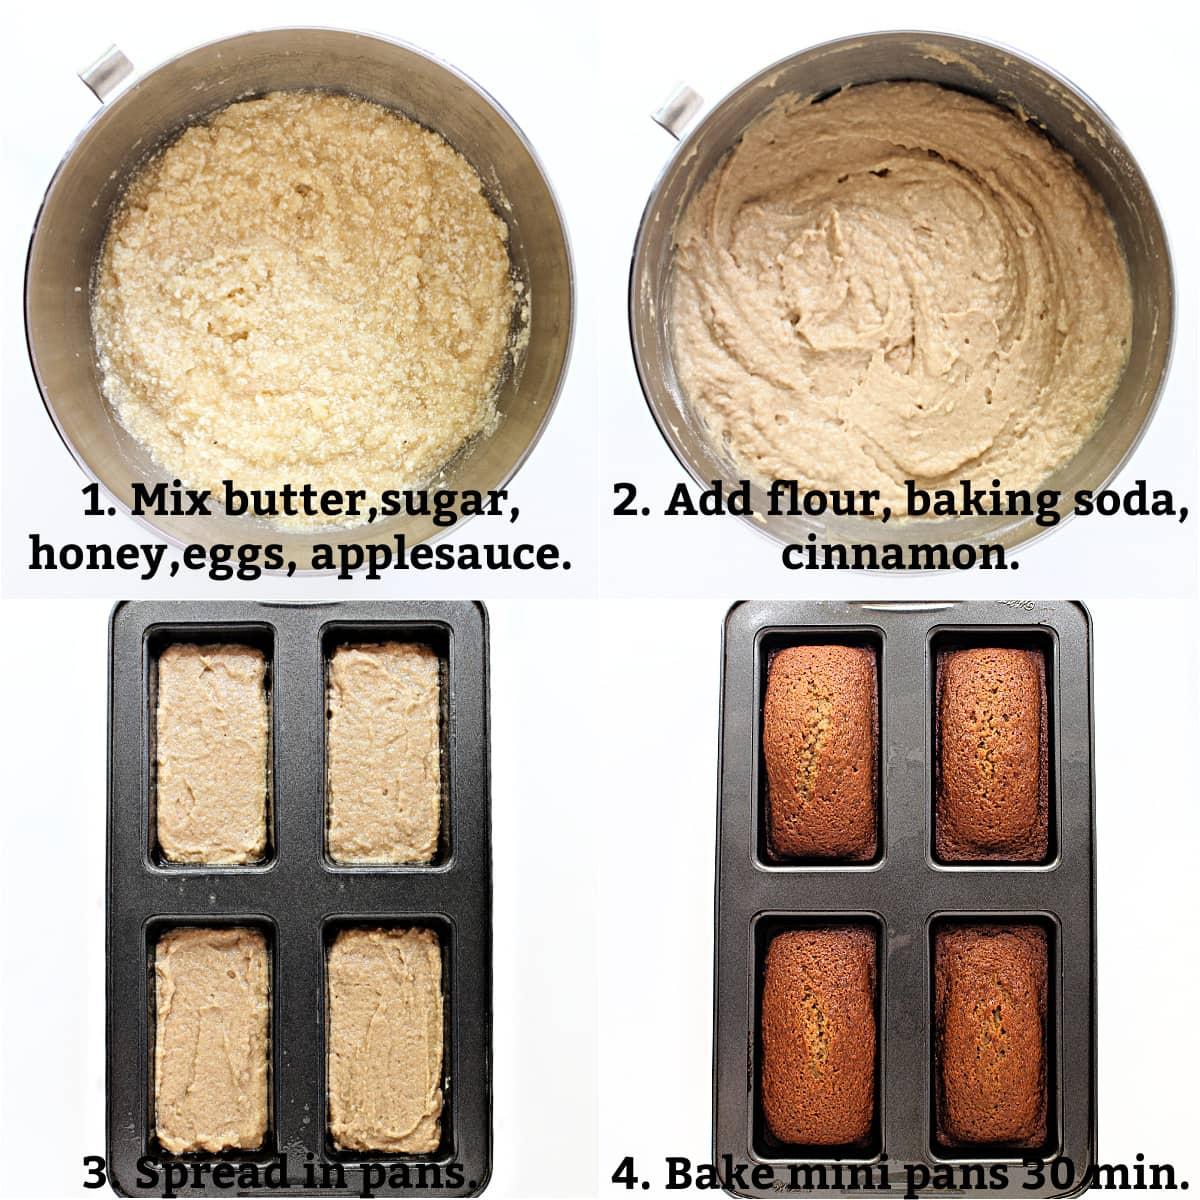 Honey Cake instructions; mix wet ingredients, add dry ingredients, spread in pans, bake until golden.